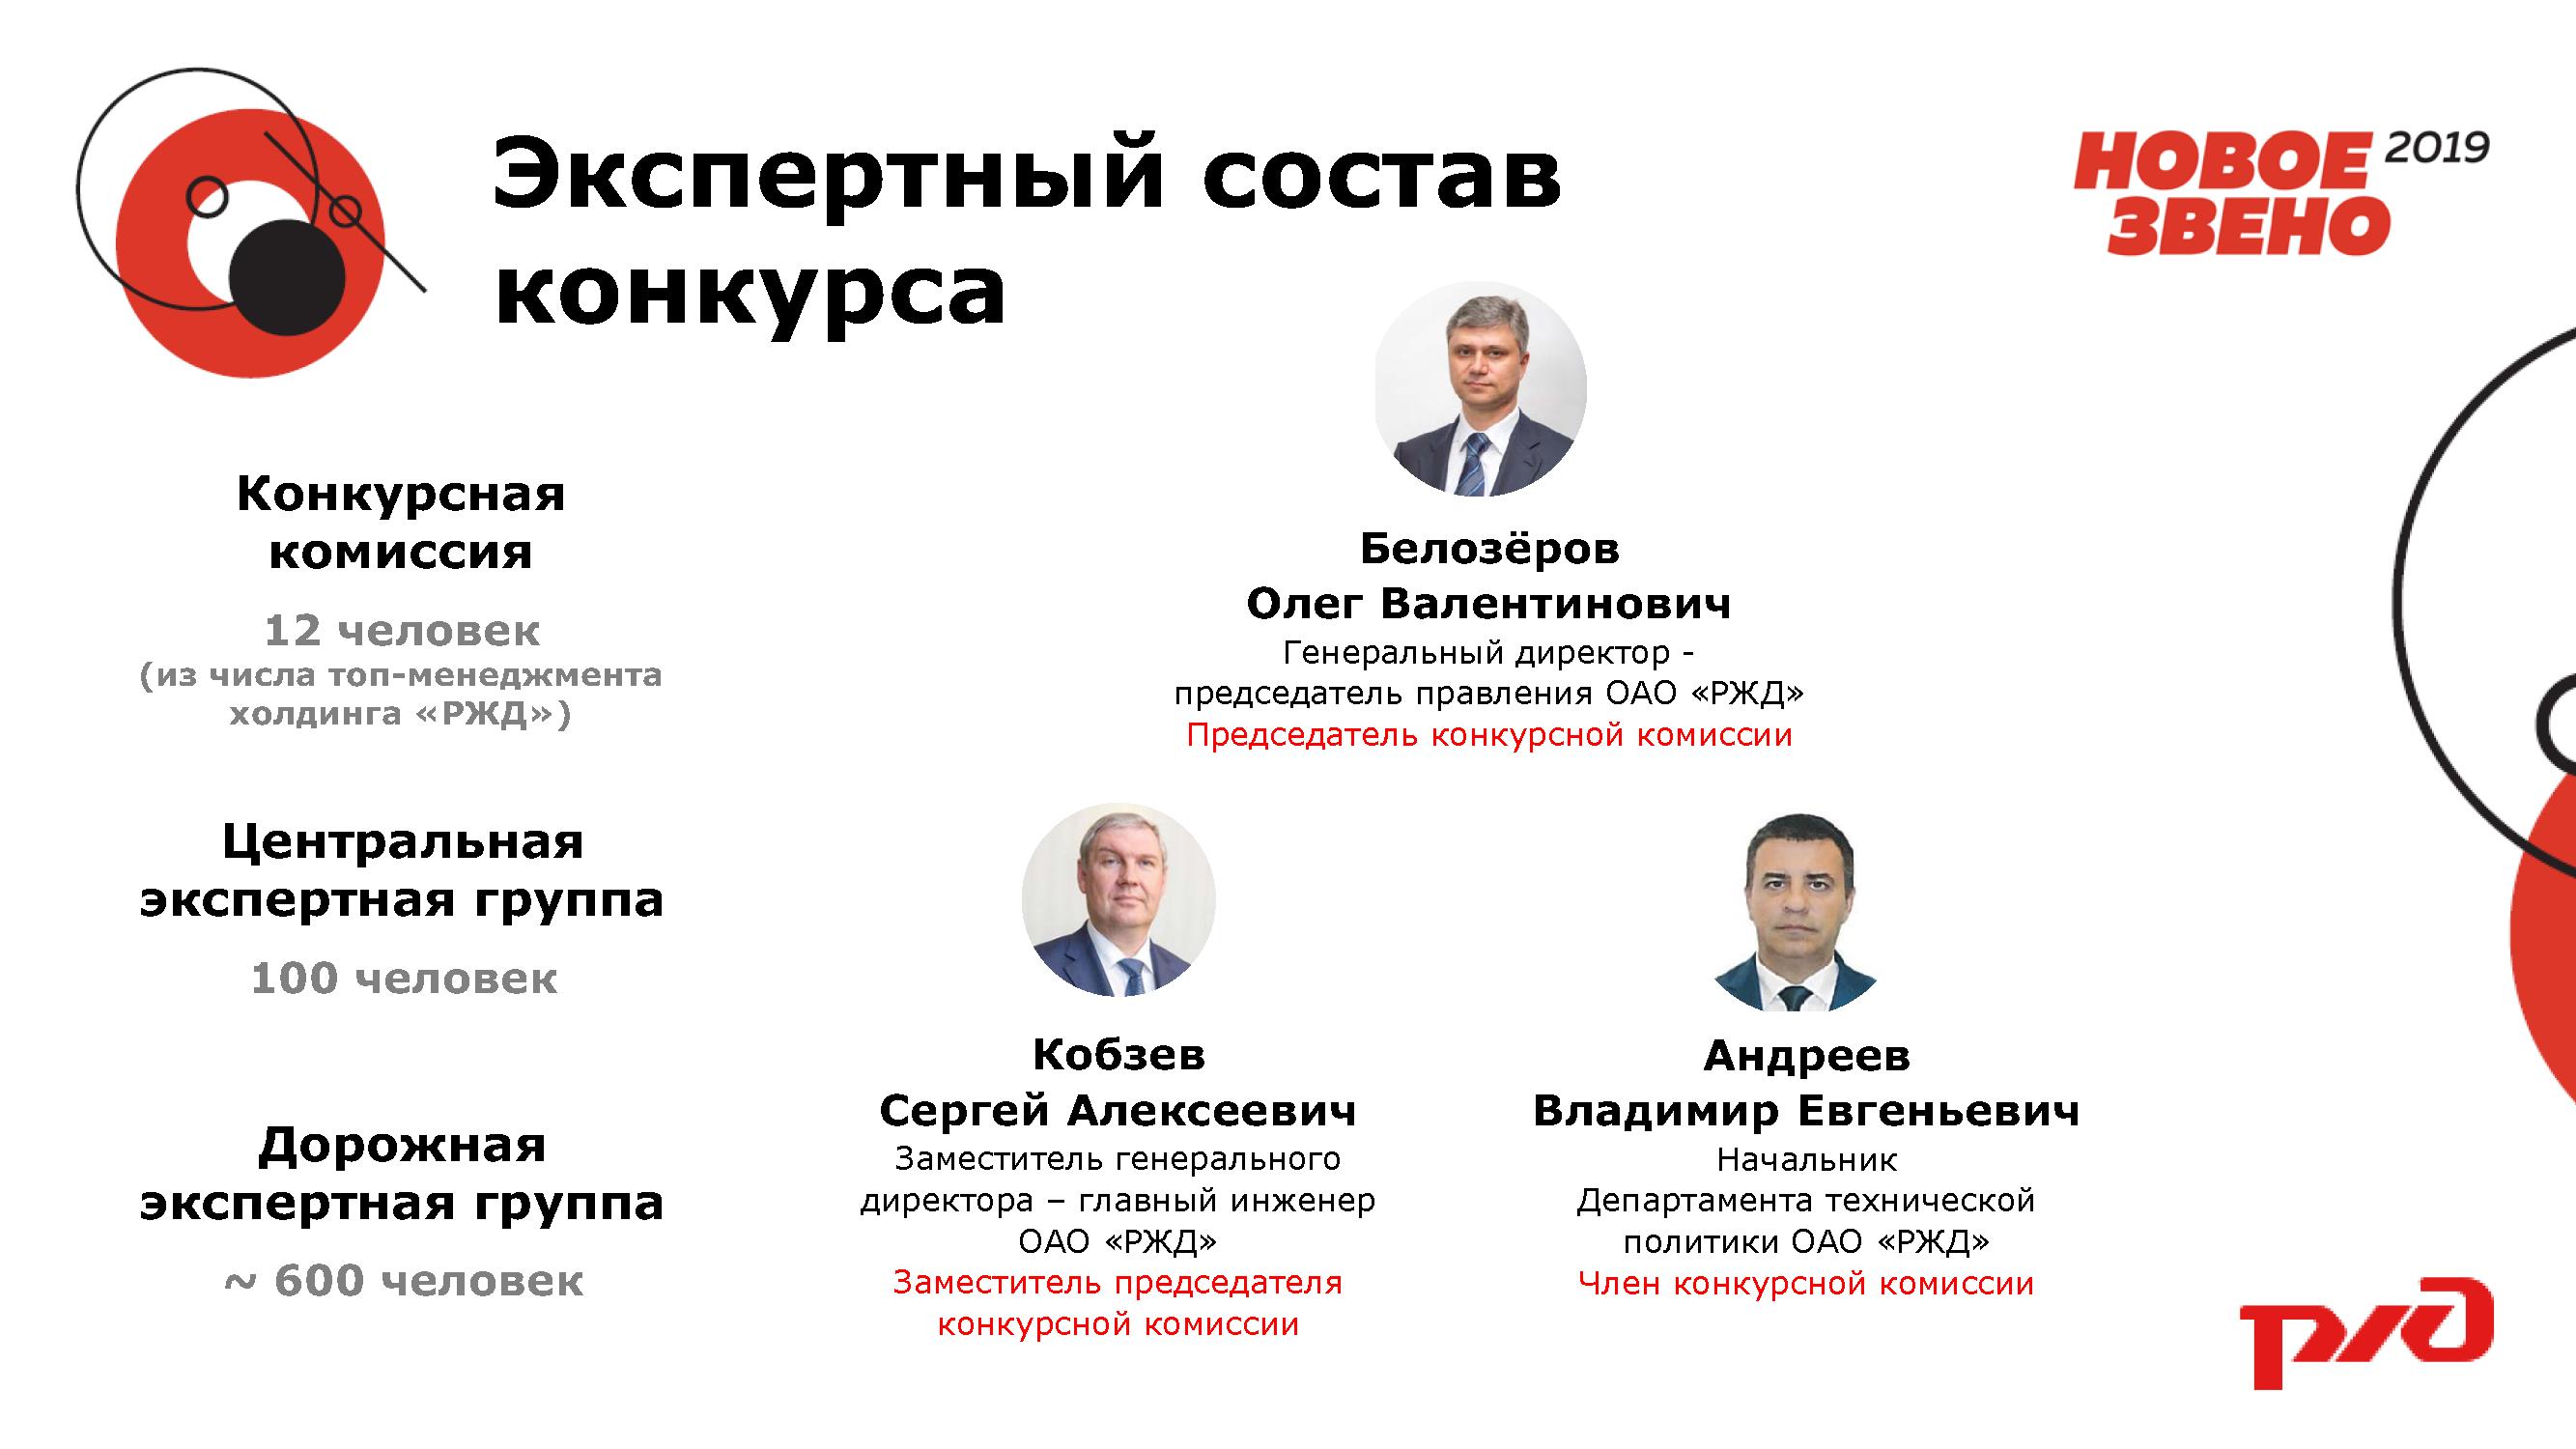 Общая презентация_Новое звено ИТОГ_Страница_8